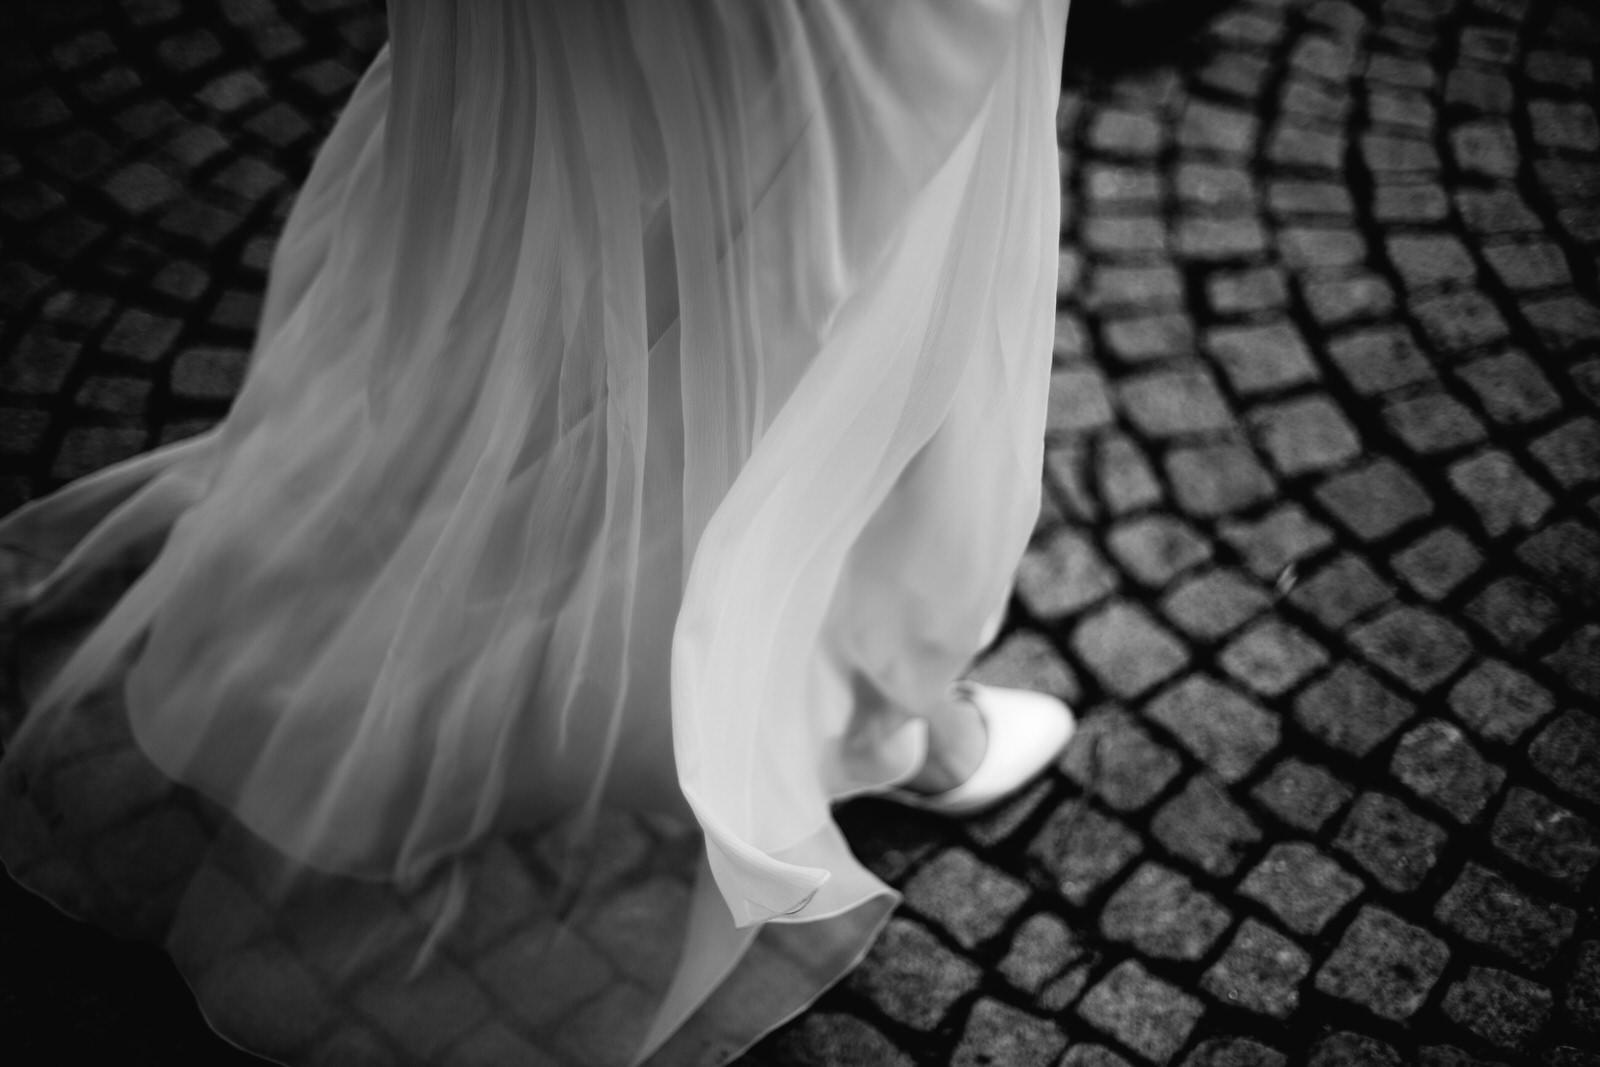 Paul_Traeger_Hochzeitsfotograf_Thueringen_Erfurt_Jena_Weimar_100220344.JPG